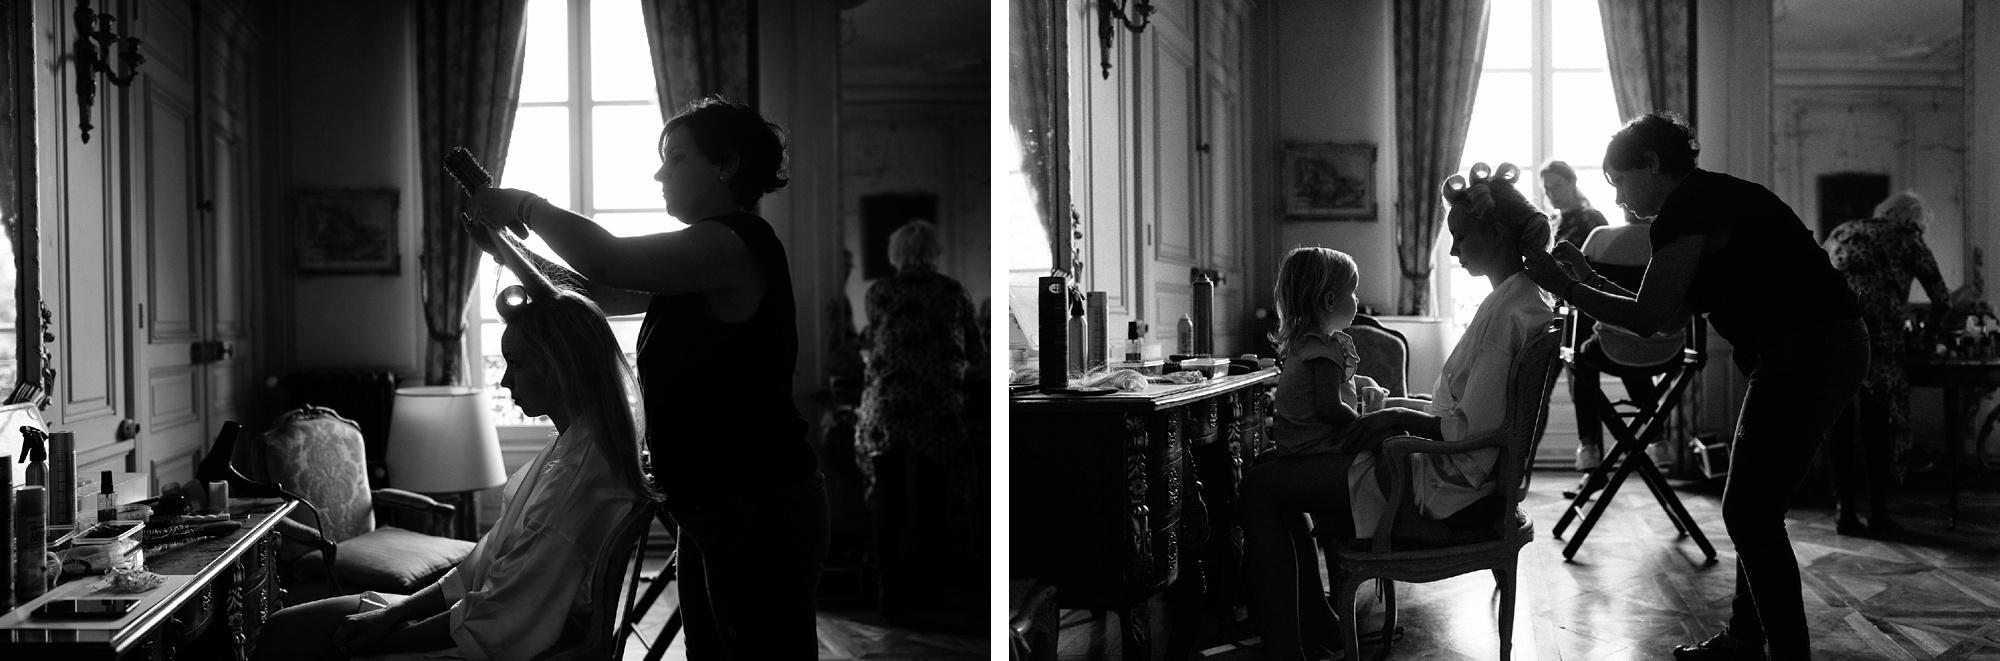 Wedding-Chateau-de-Varennes-011.jpg